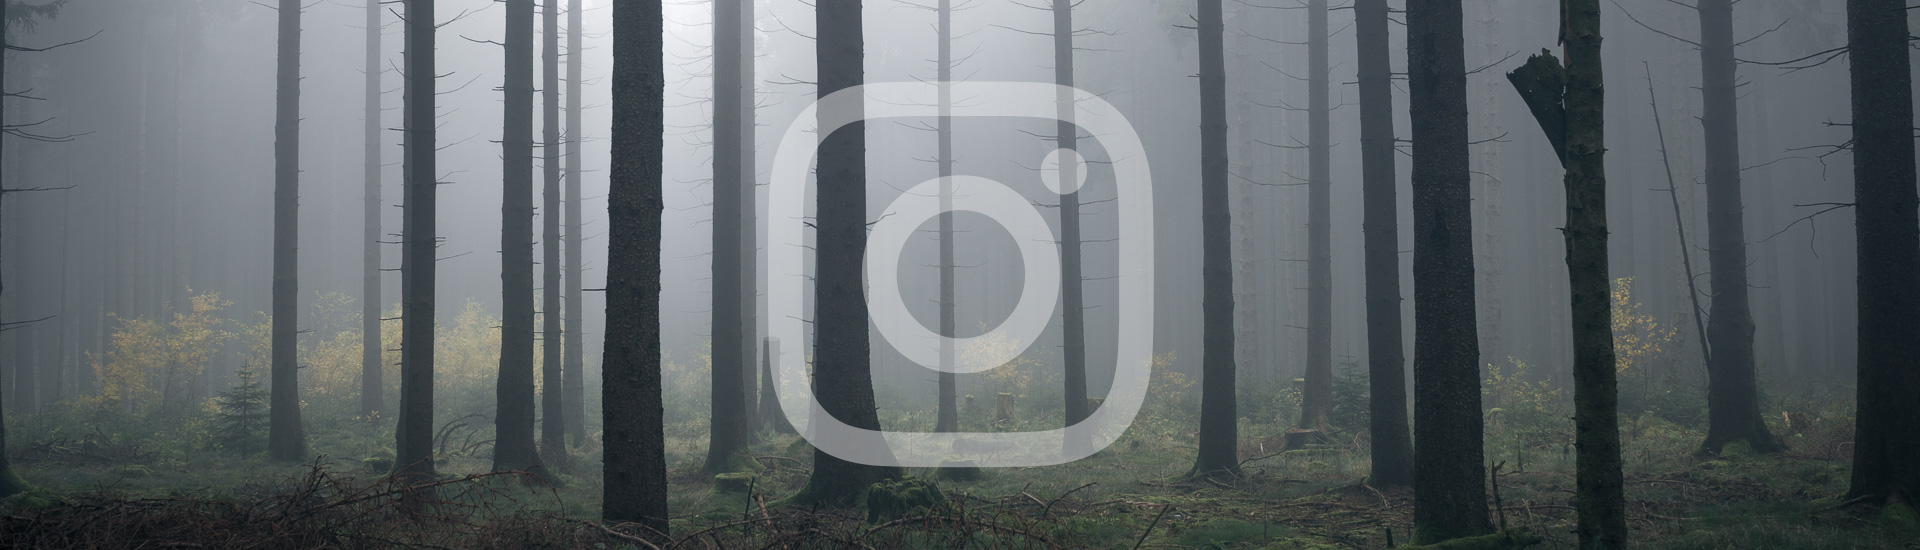 Instagram Look mit Lightroom selbst erstellen – mit Presets